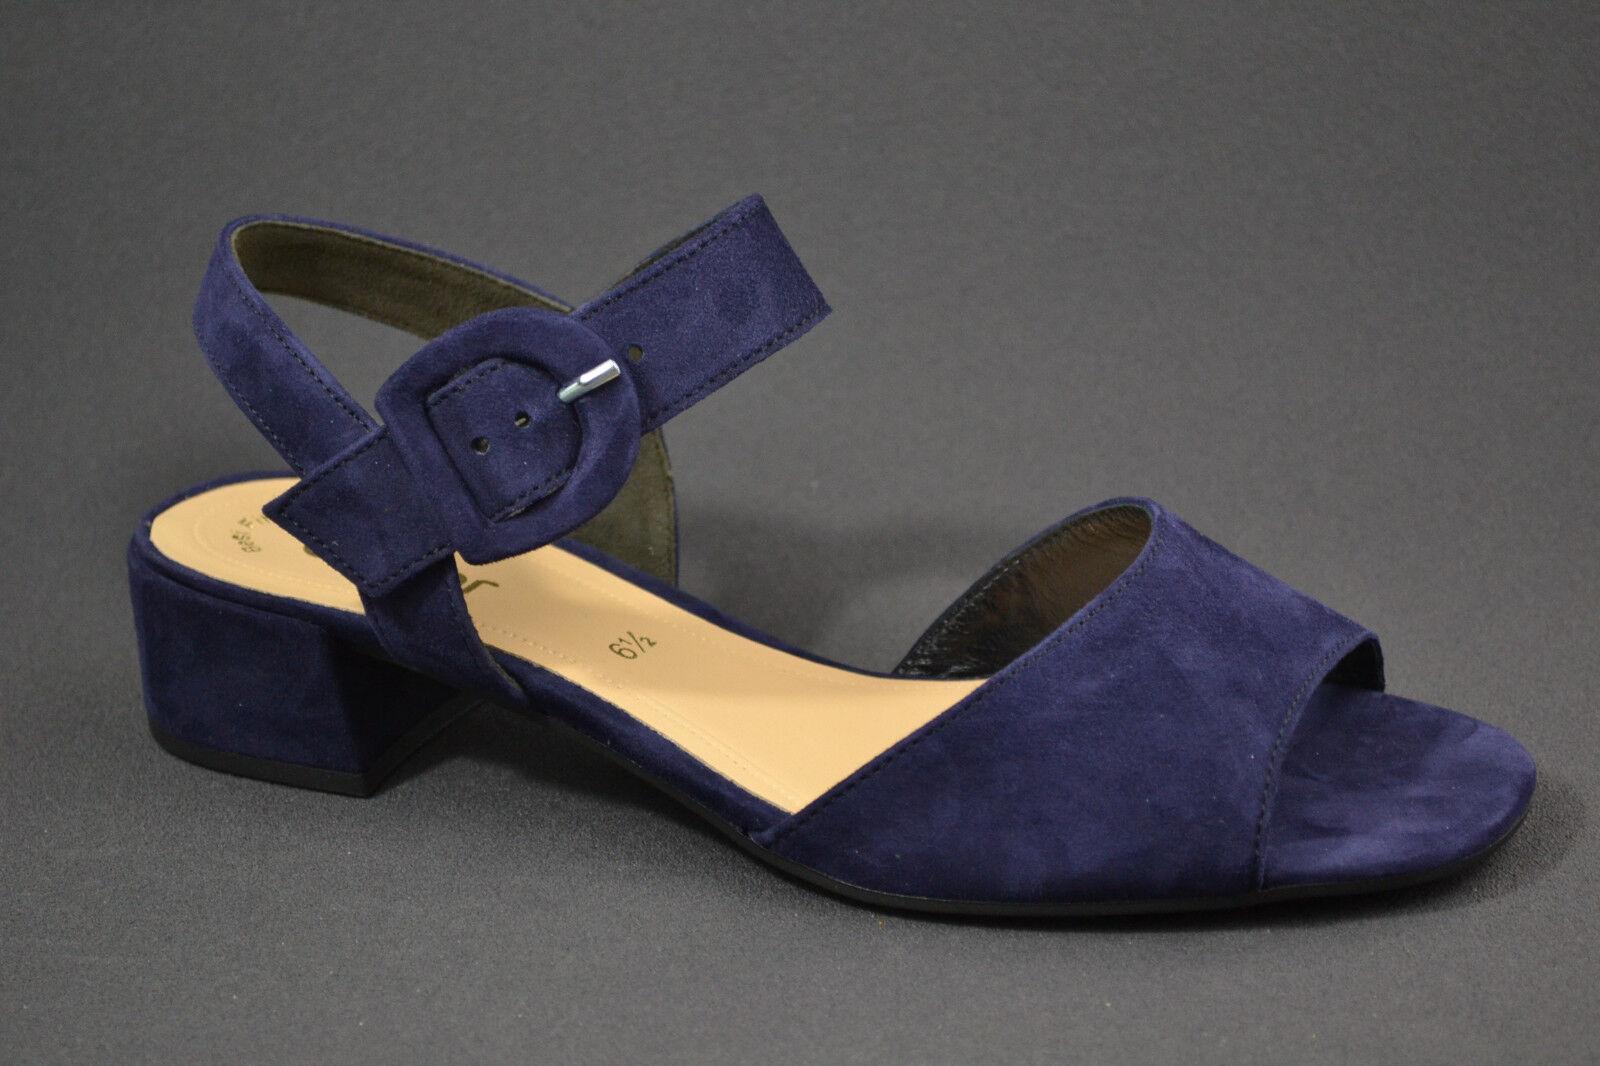 Gabor Damen Sandalen Sandaletten blau 81.742.16 blau Sandaletten Nubuk Leder  NEU 9c91db